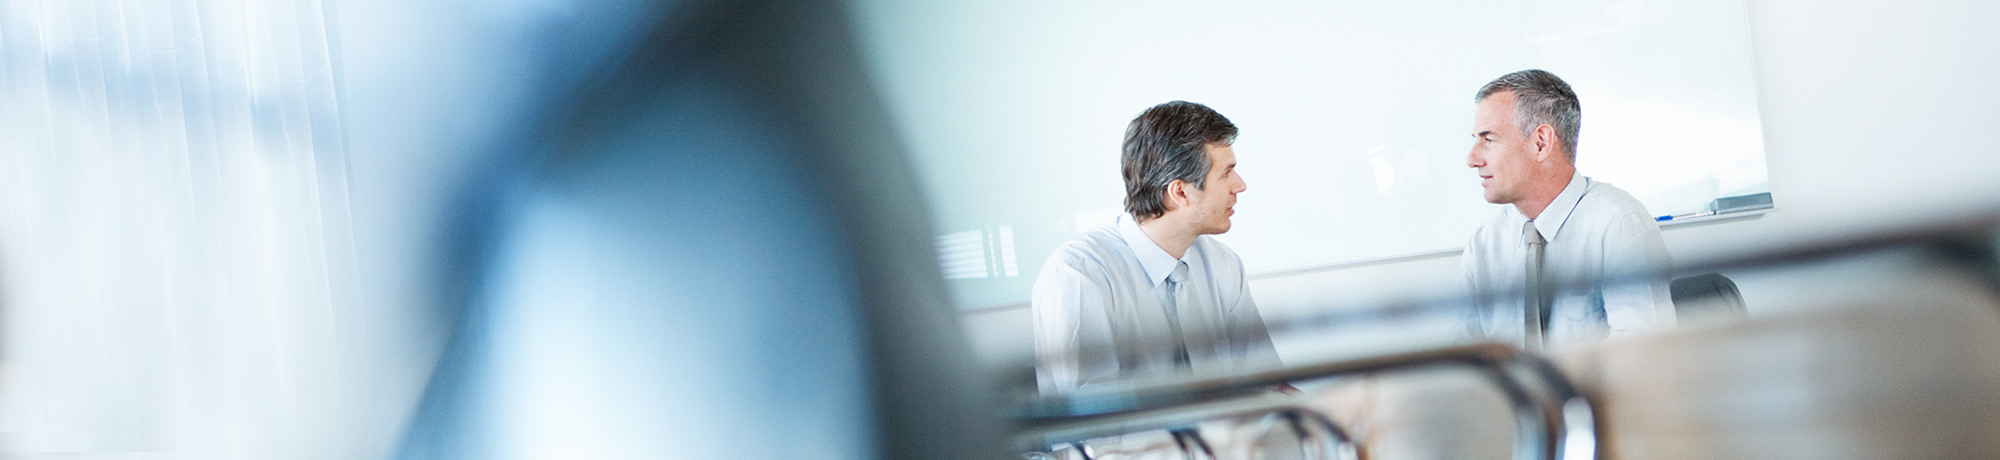 otris compliance Compliance Software, Richtlinienmanagement - Banner